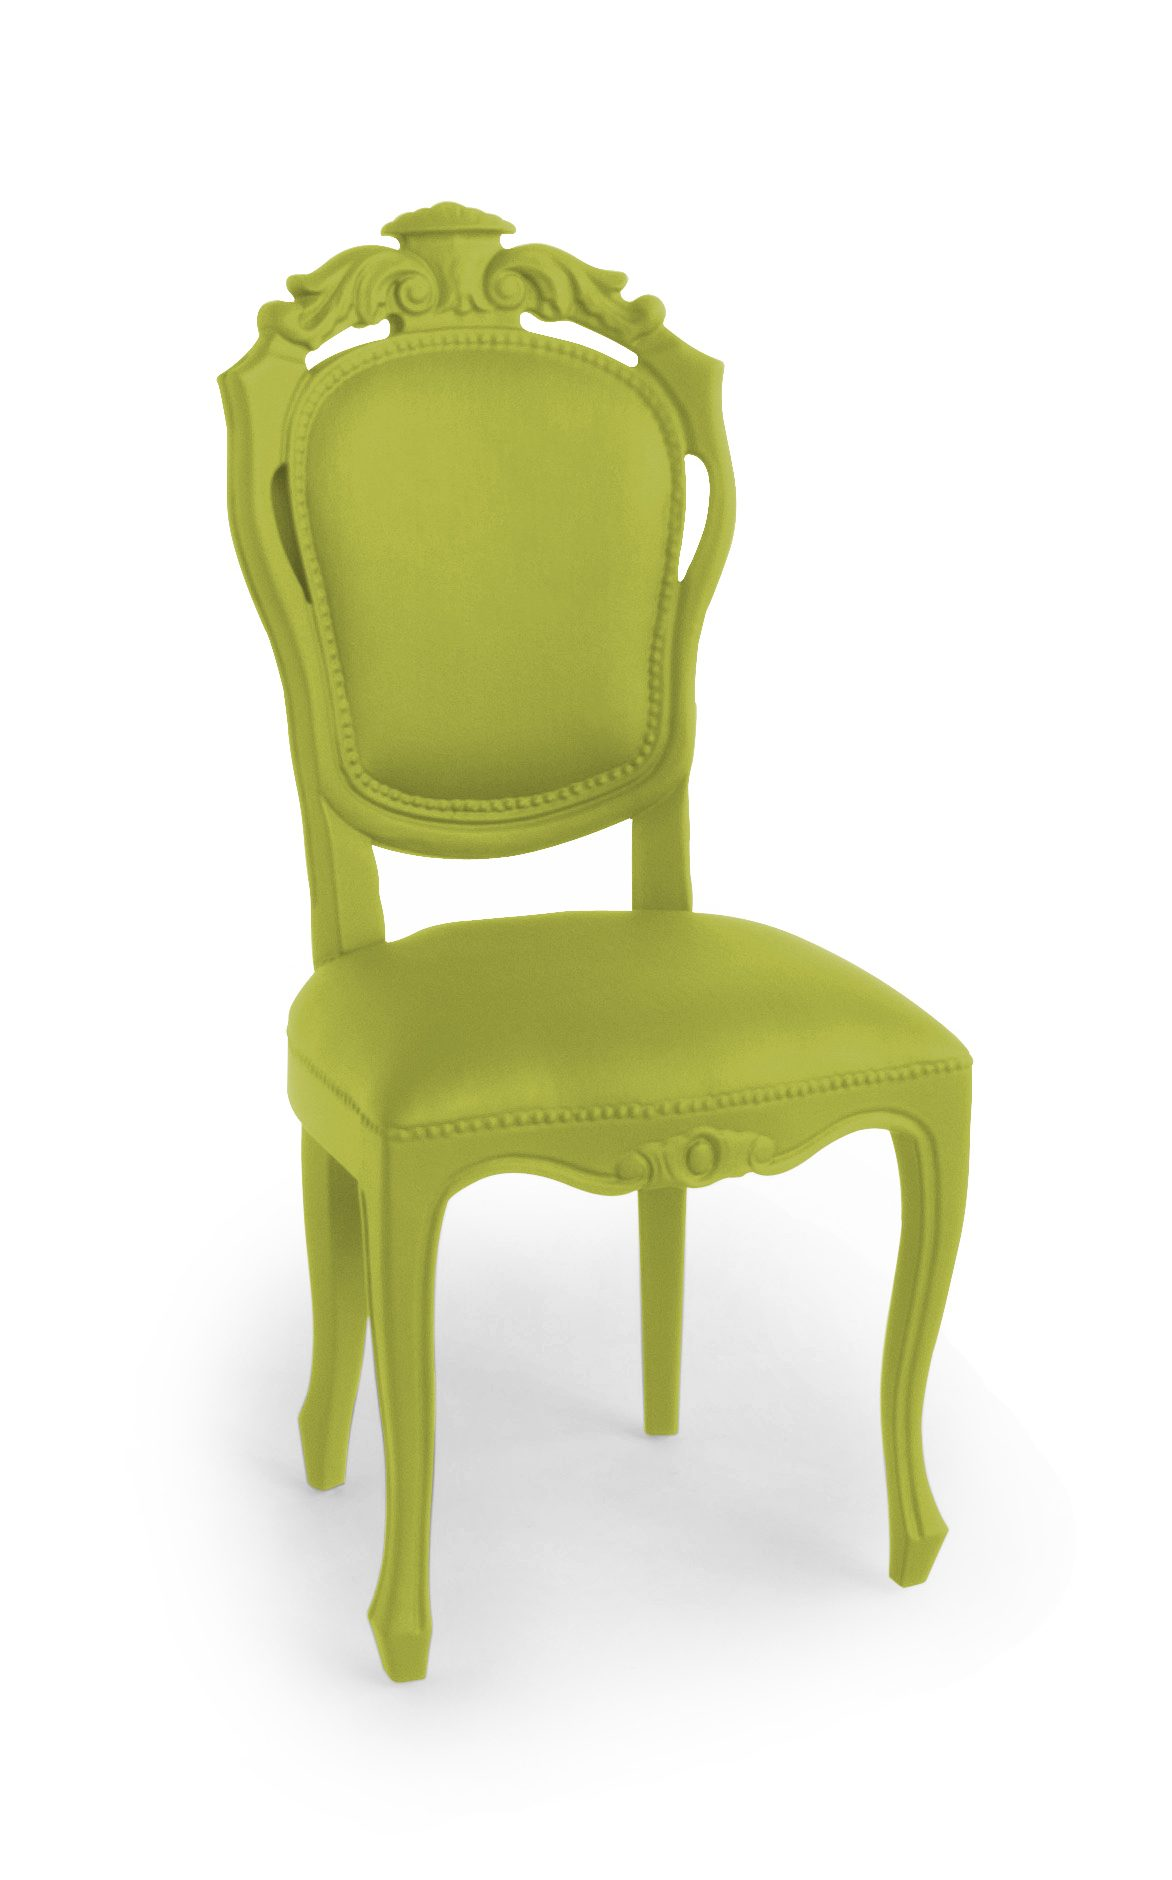 JSPR Plastic Fantastic Dining Chair Lime Exclusieve Stoel Dutch Design Webshop